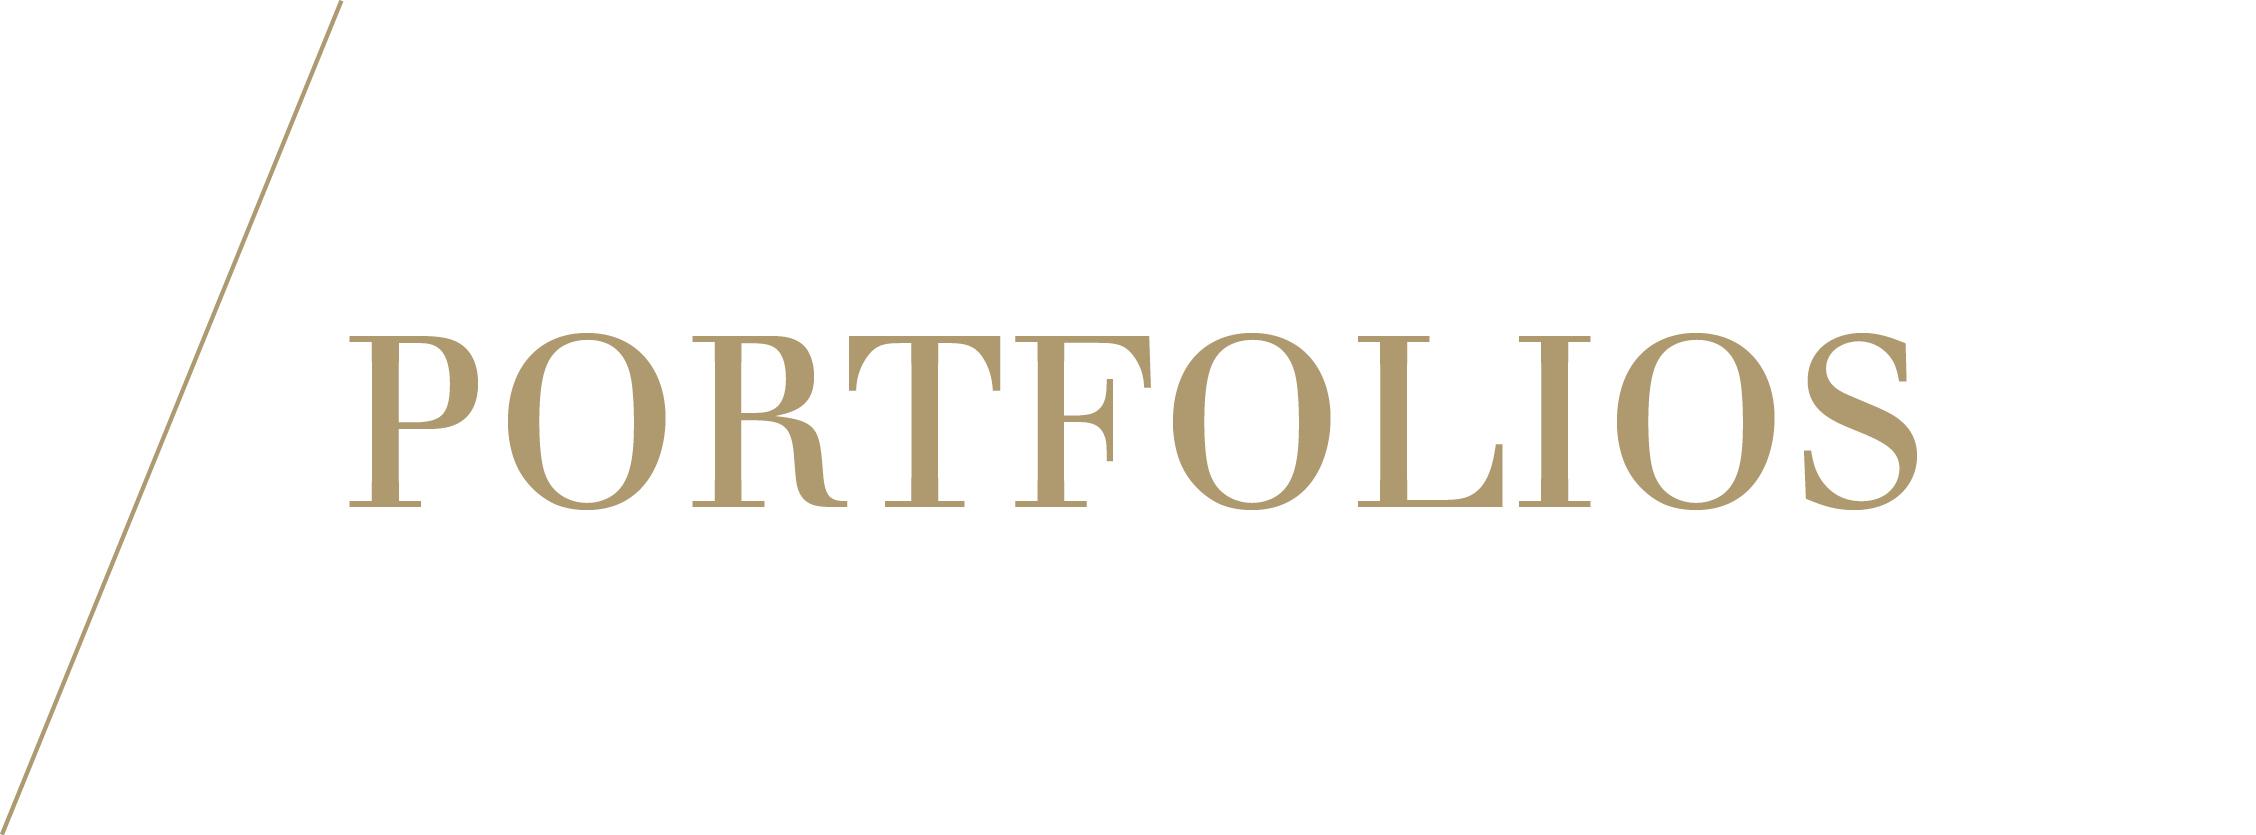 portfolios-text-serif.jpg